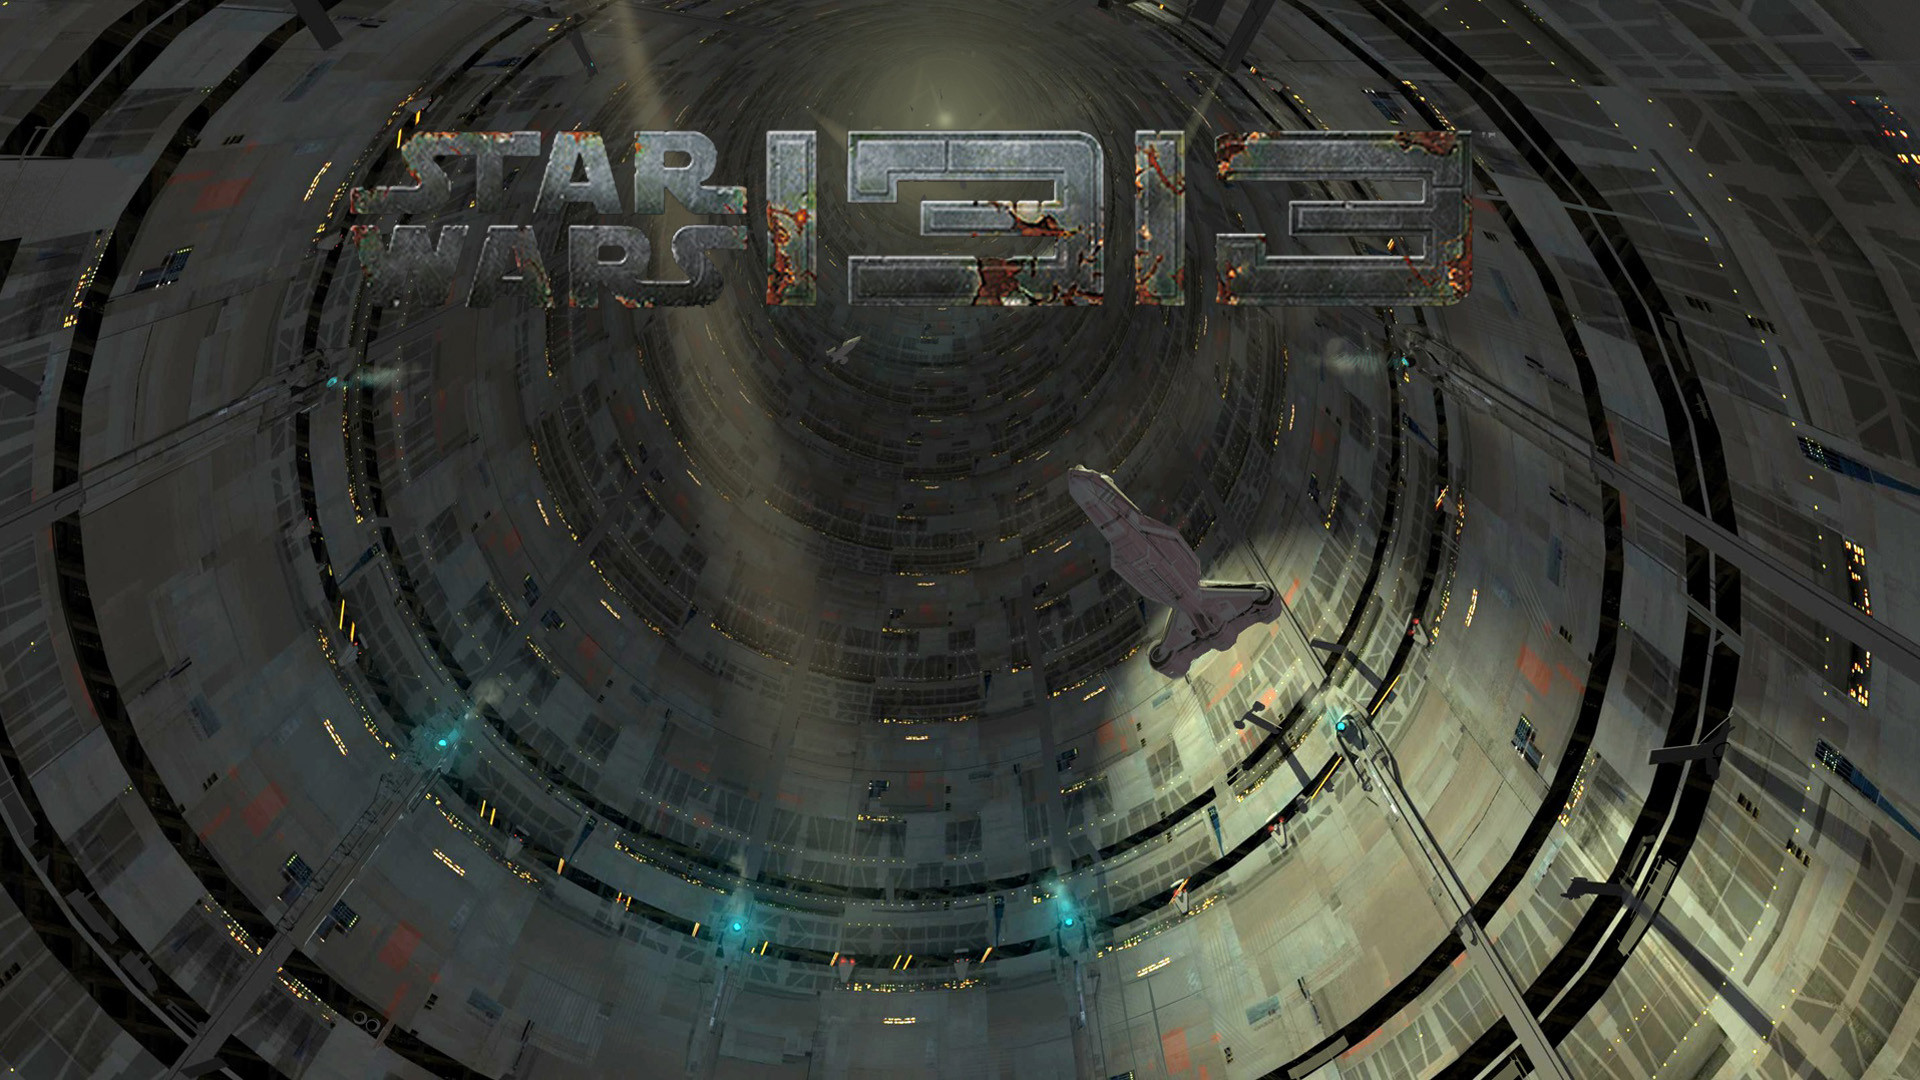 Star Wars 1313 Spaceship wallpaper